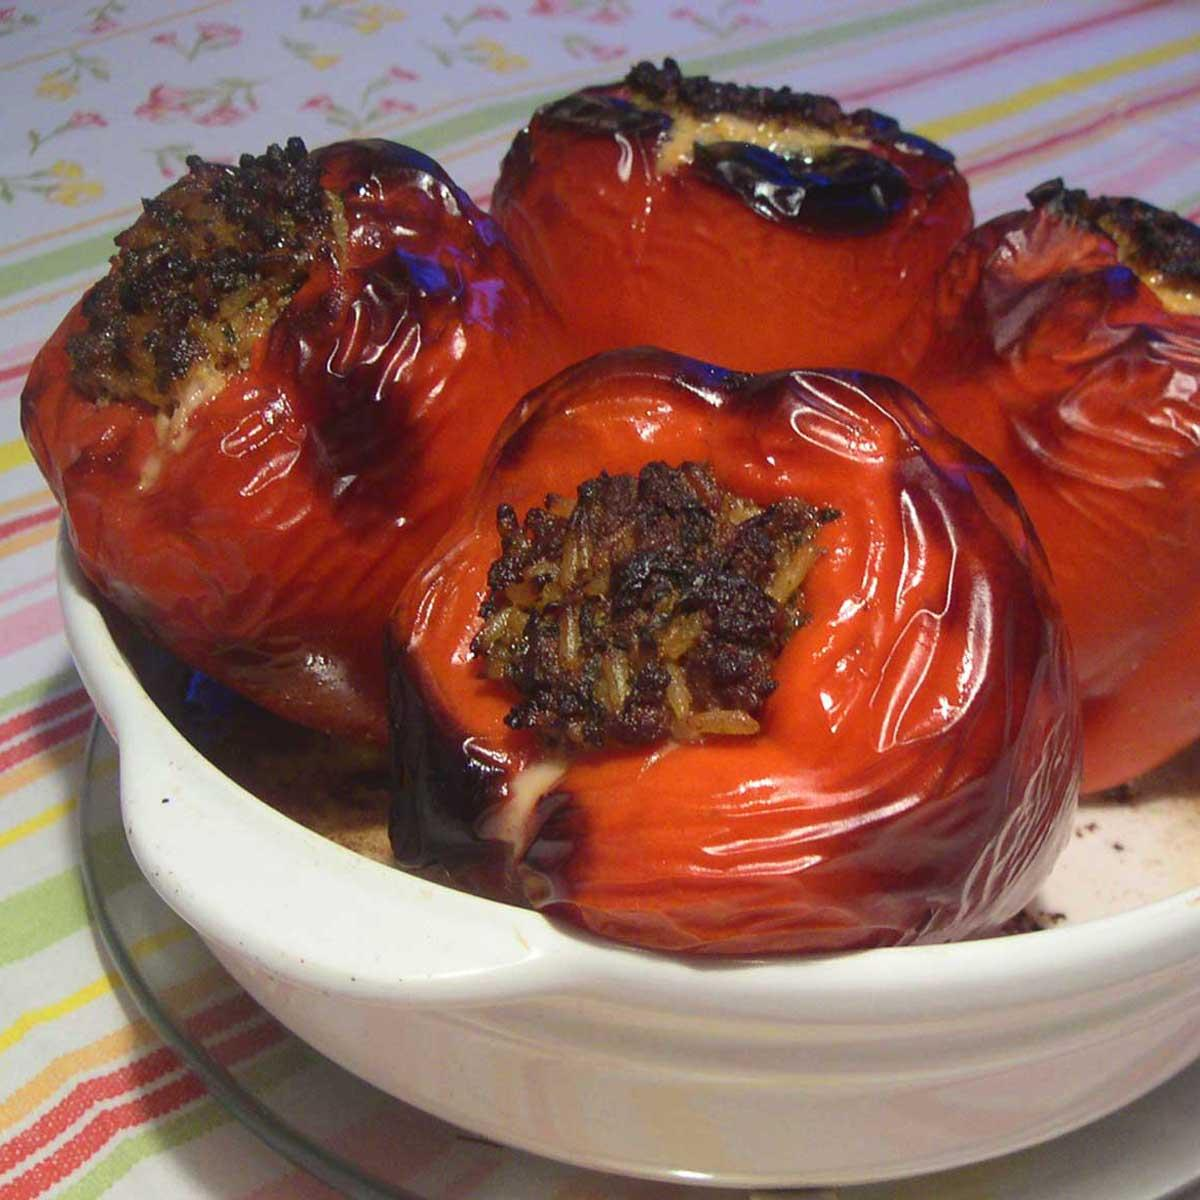 Recette poivrons farcis cuisine madame figaro - Madame figaro cuisine ...